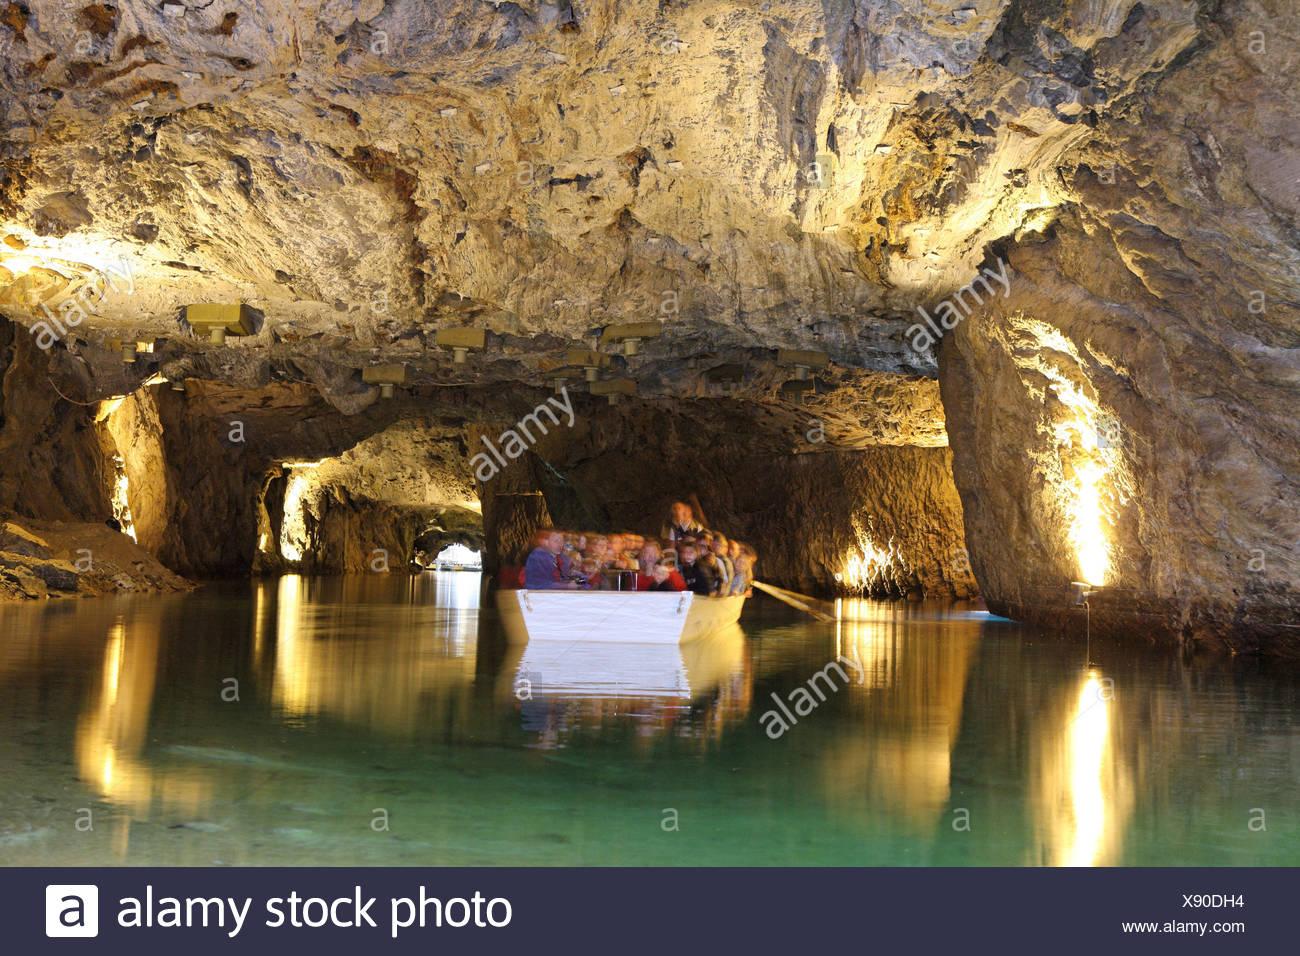 Switzerland Europe Saint-Léonard underground lake Indoor Inside landscape alpine alps mountain mountains Ca - Stock Image